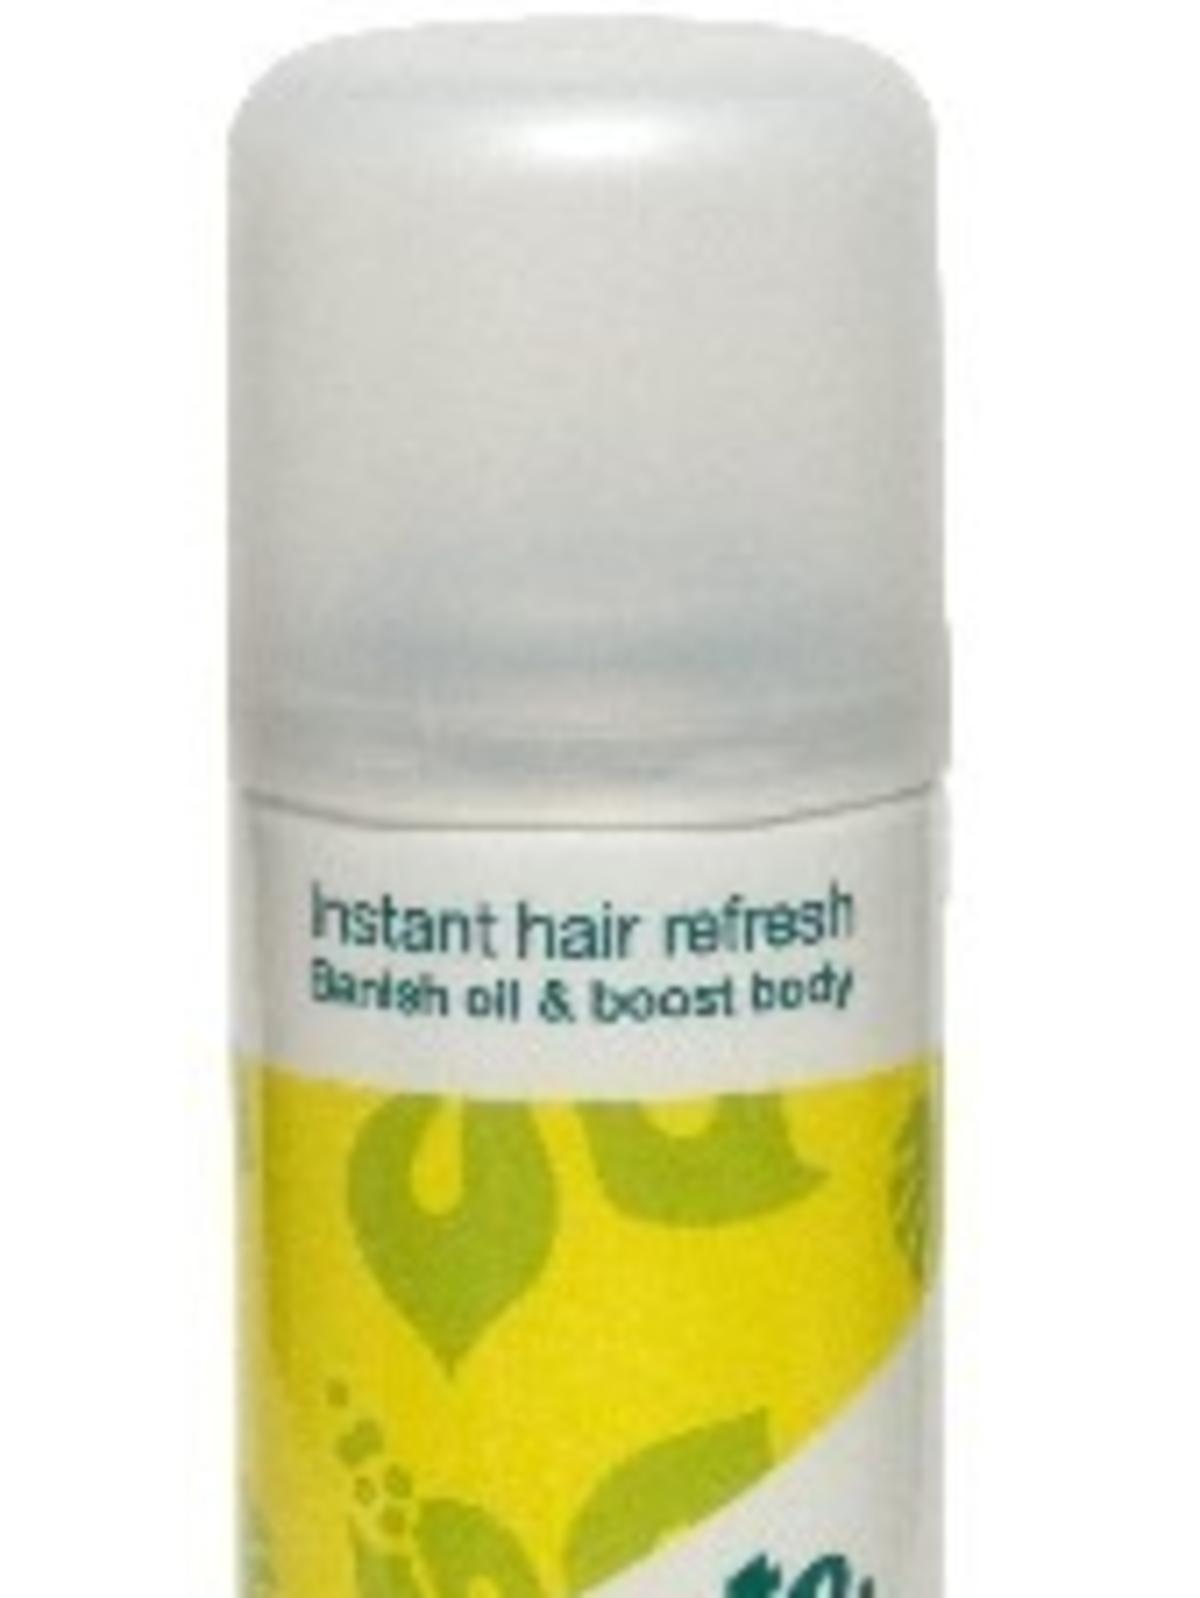 Batiste, Dry Shampoo Tropical